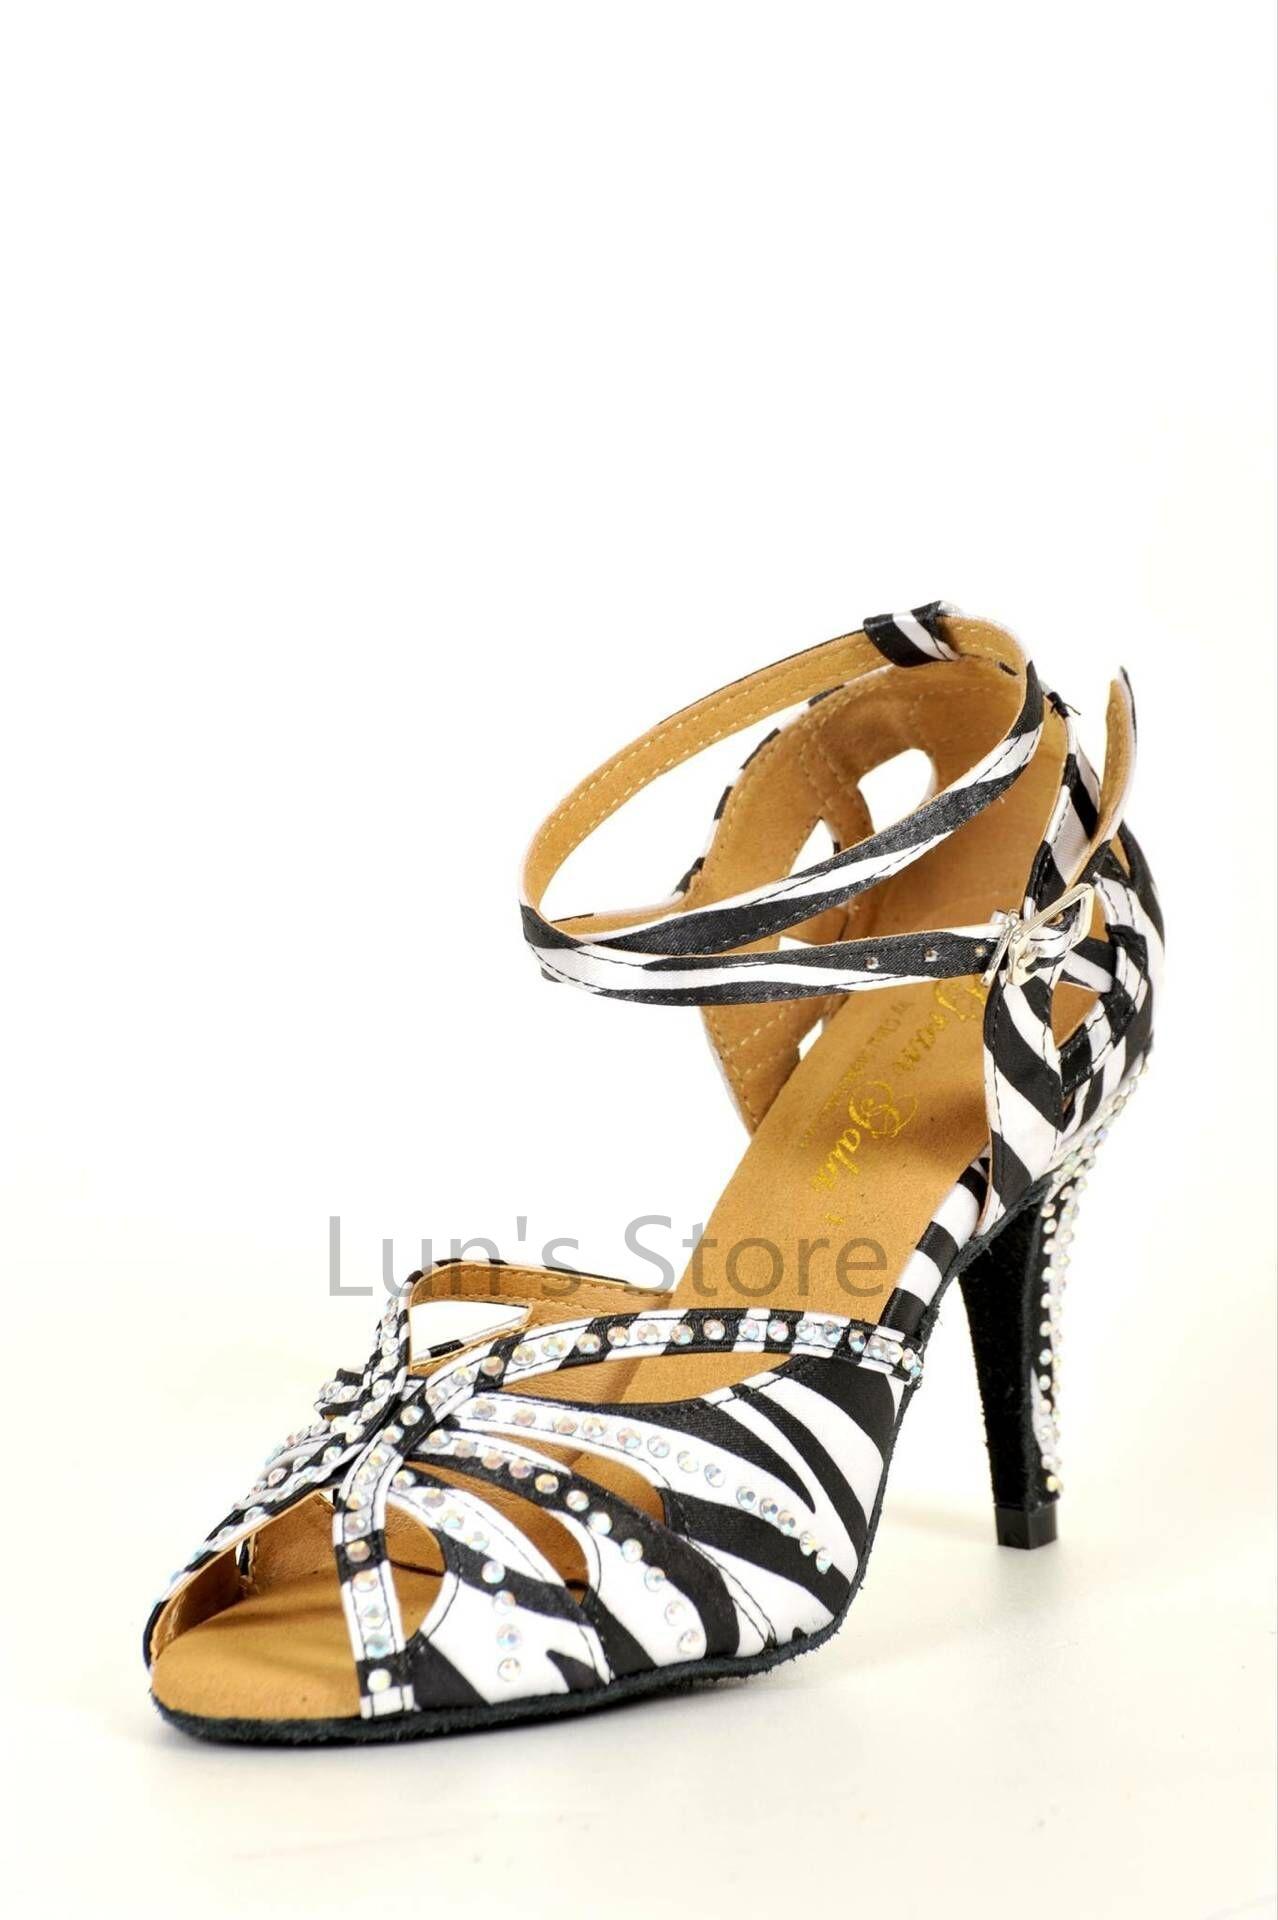 New Ladies Zebra Satin Rhinestone Latin Ballroom Dance Shoes Salsa Dance Shoes Tango Bachata Dance Shoes ALL SIZE